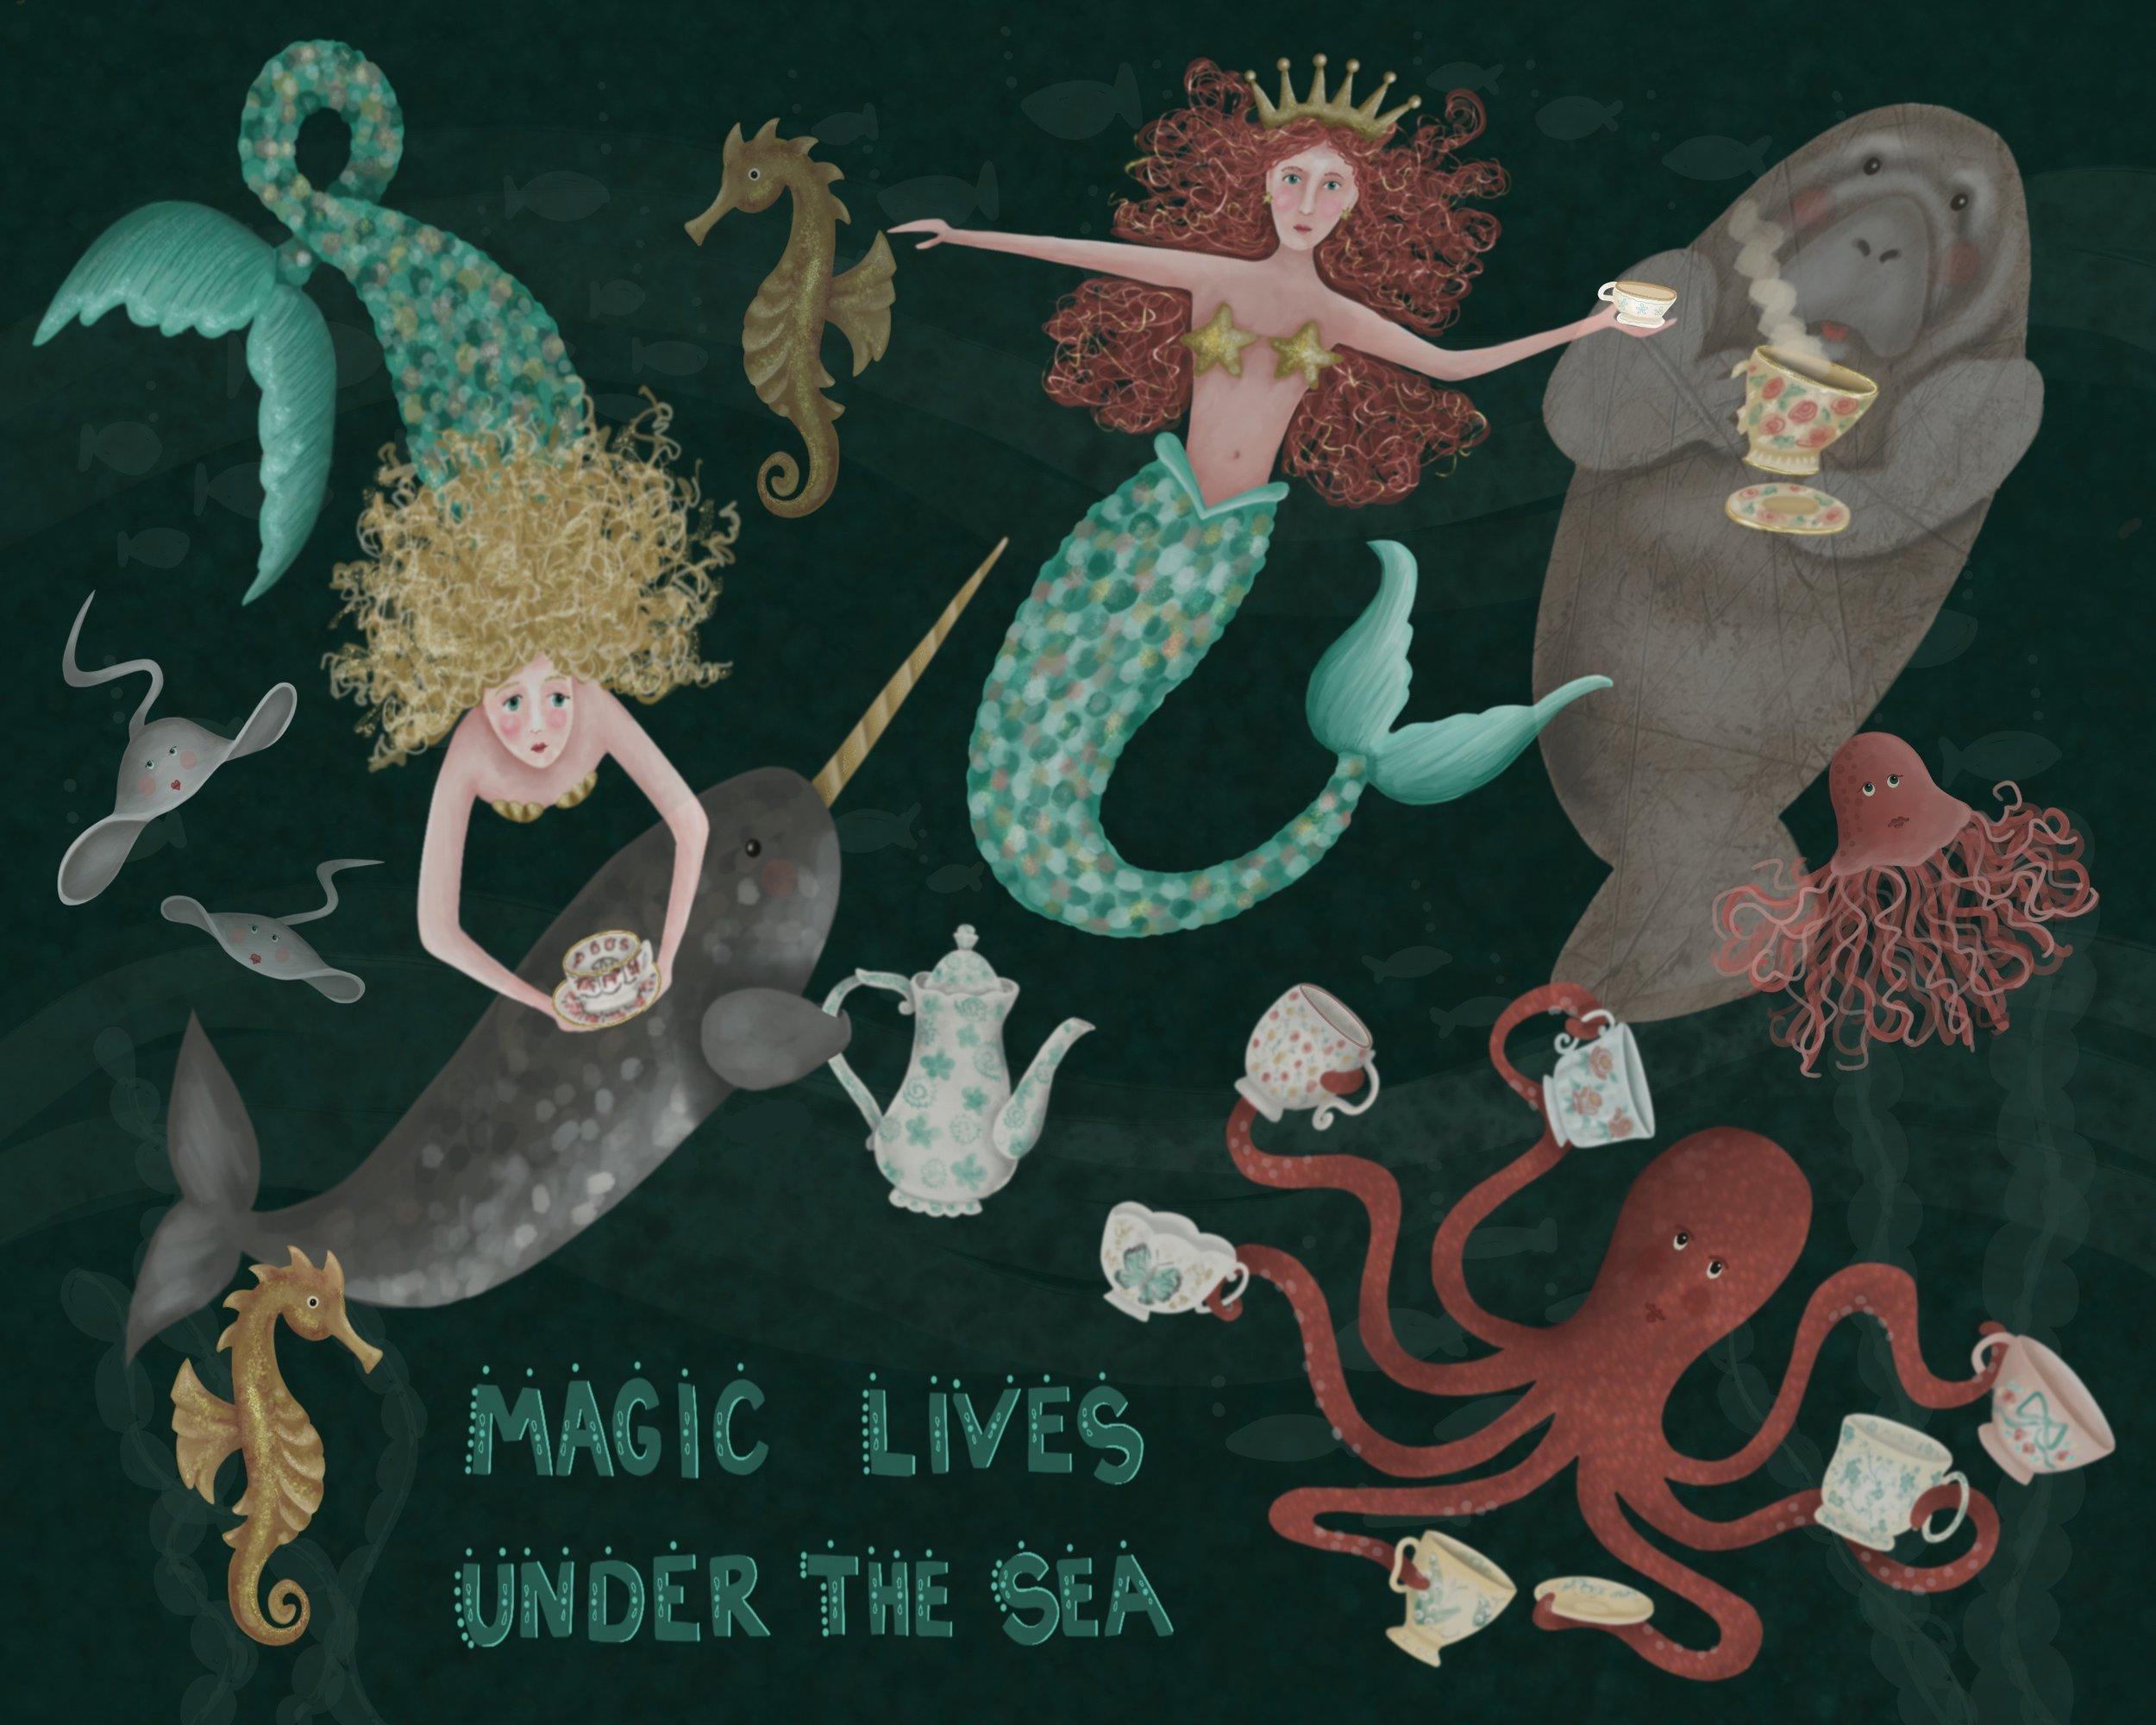 Magic Lives Under the Sea